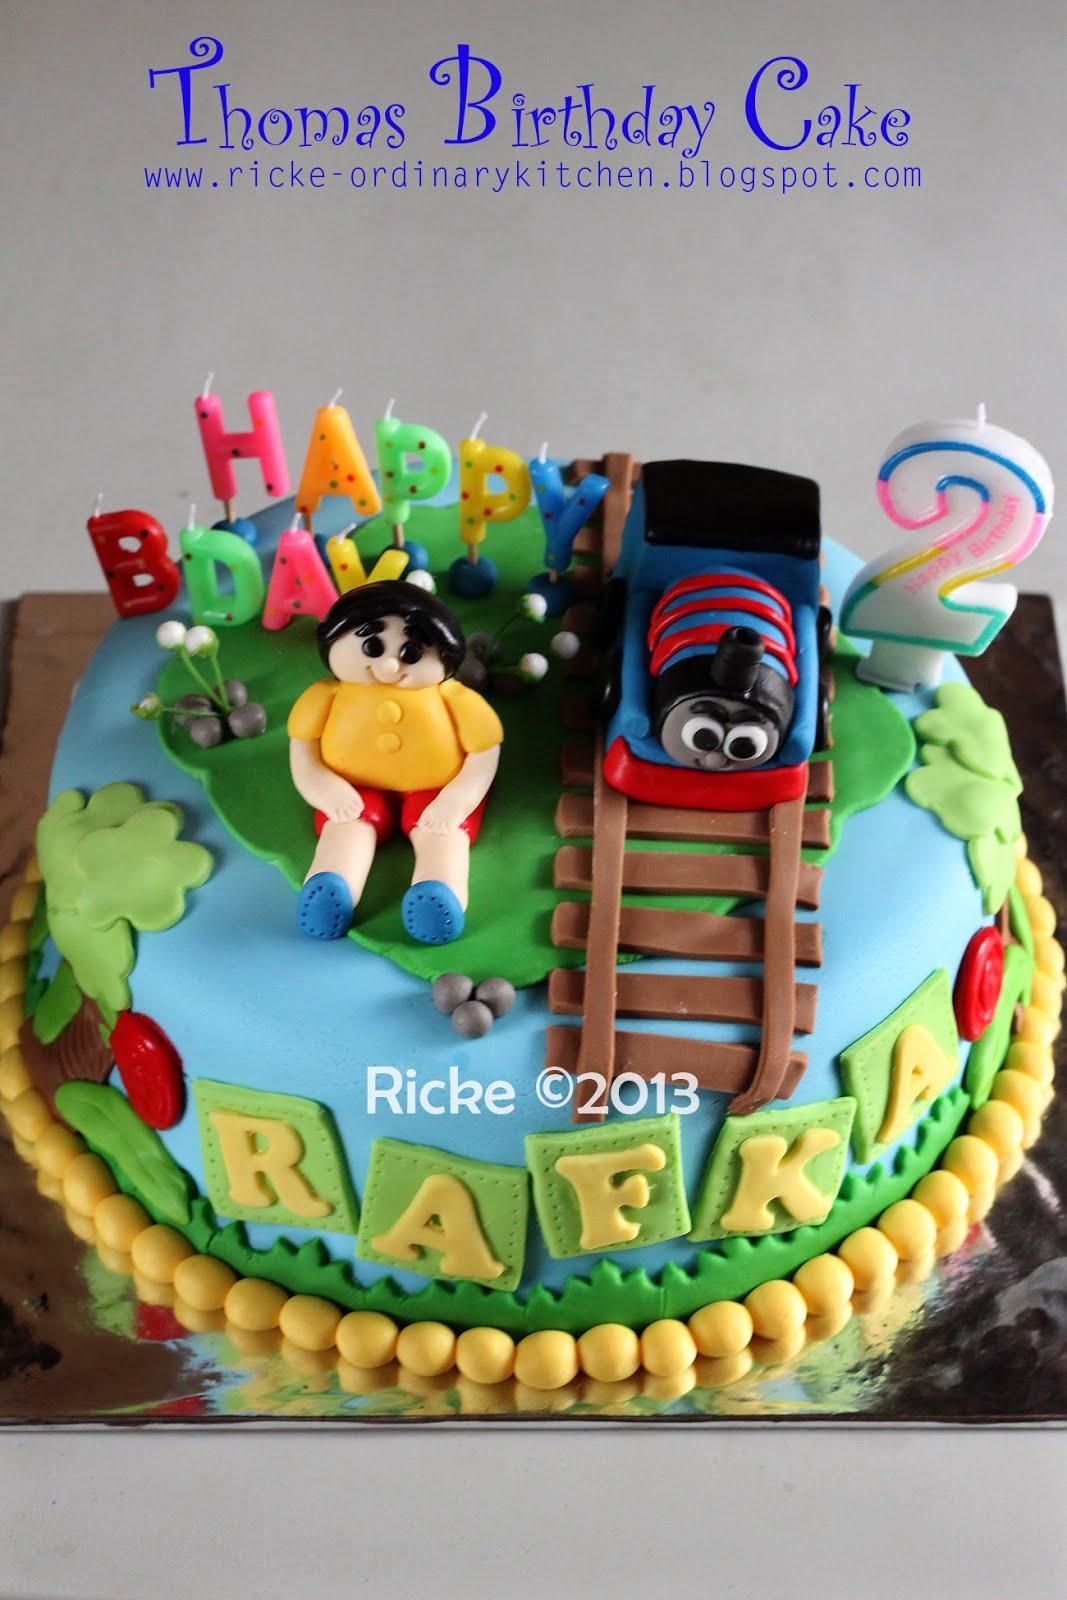 Just My Ordinary Kitchen THOMAS BIRTHDAY CAKE FOR RAFKA